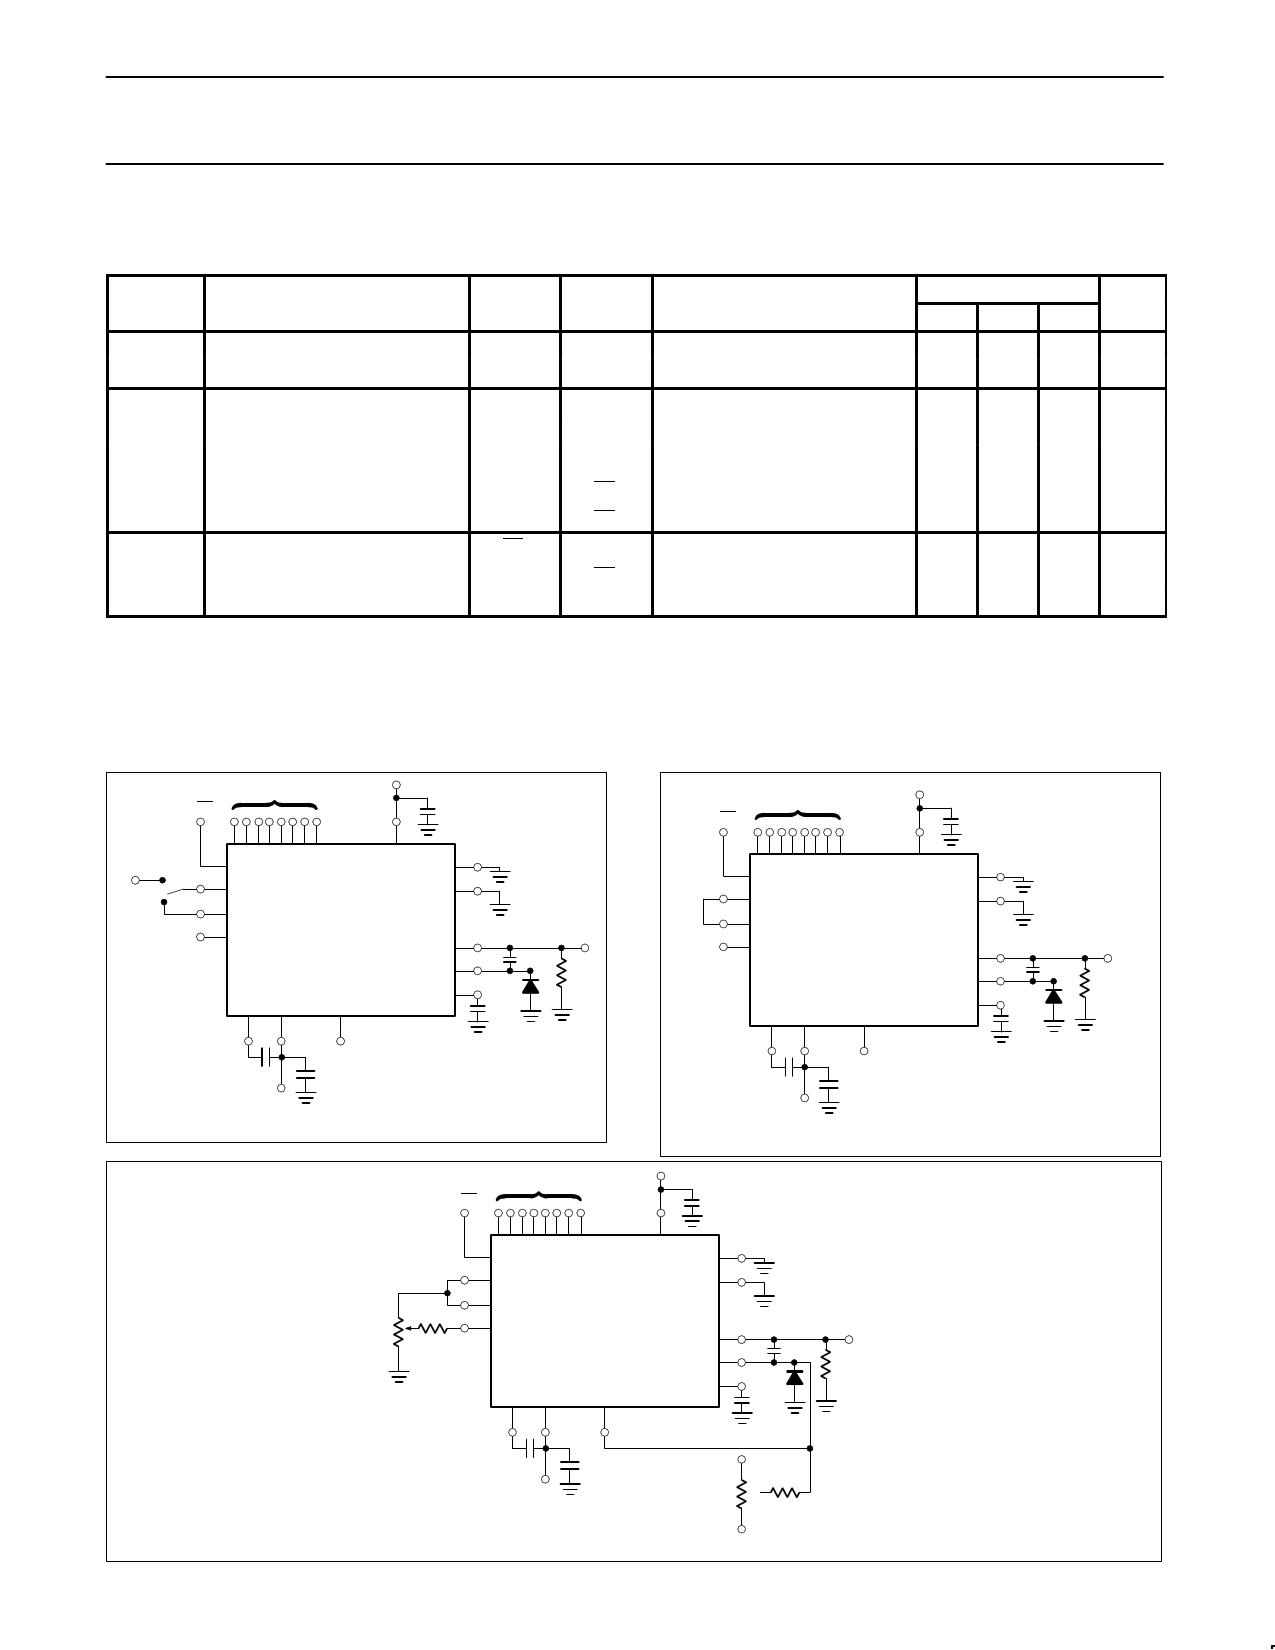 SE5019F pdf, 반도체, 판매, 대치품